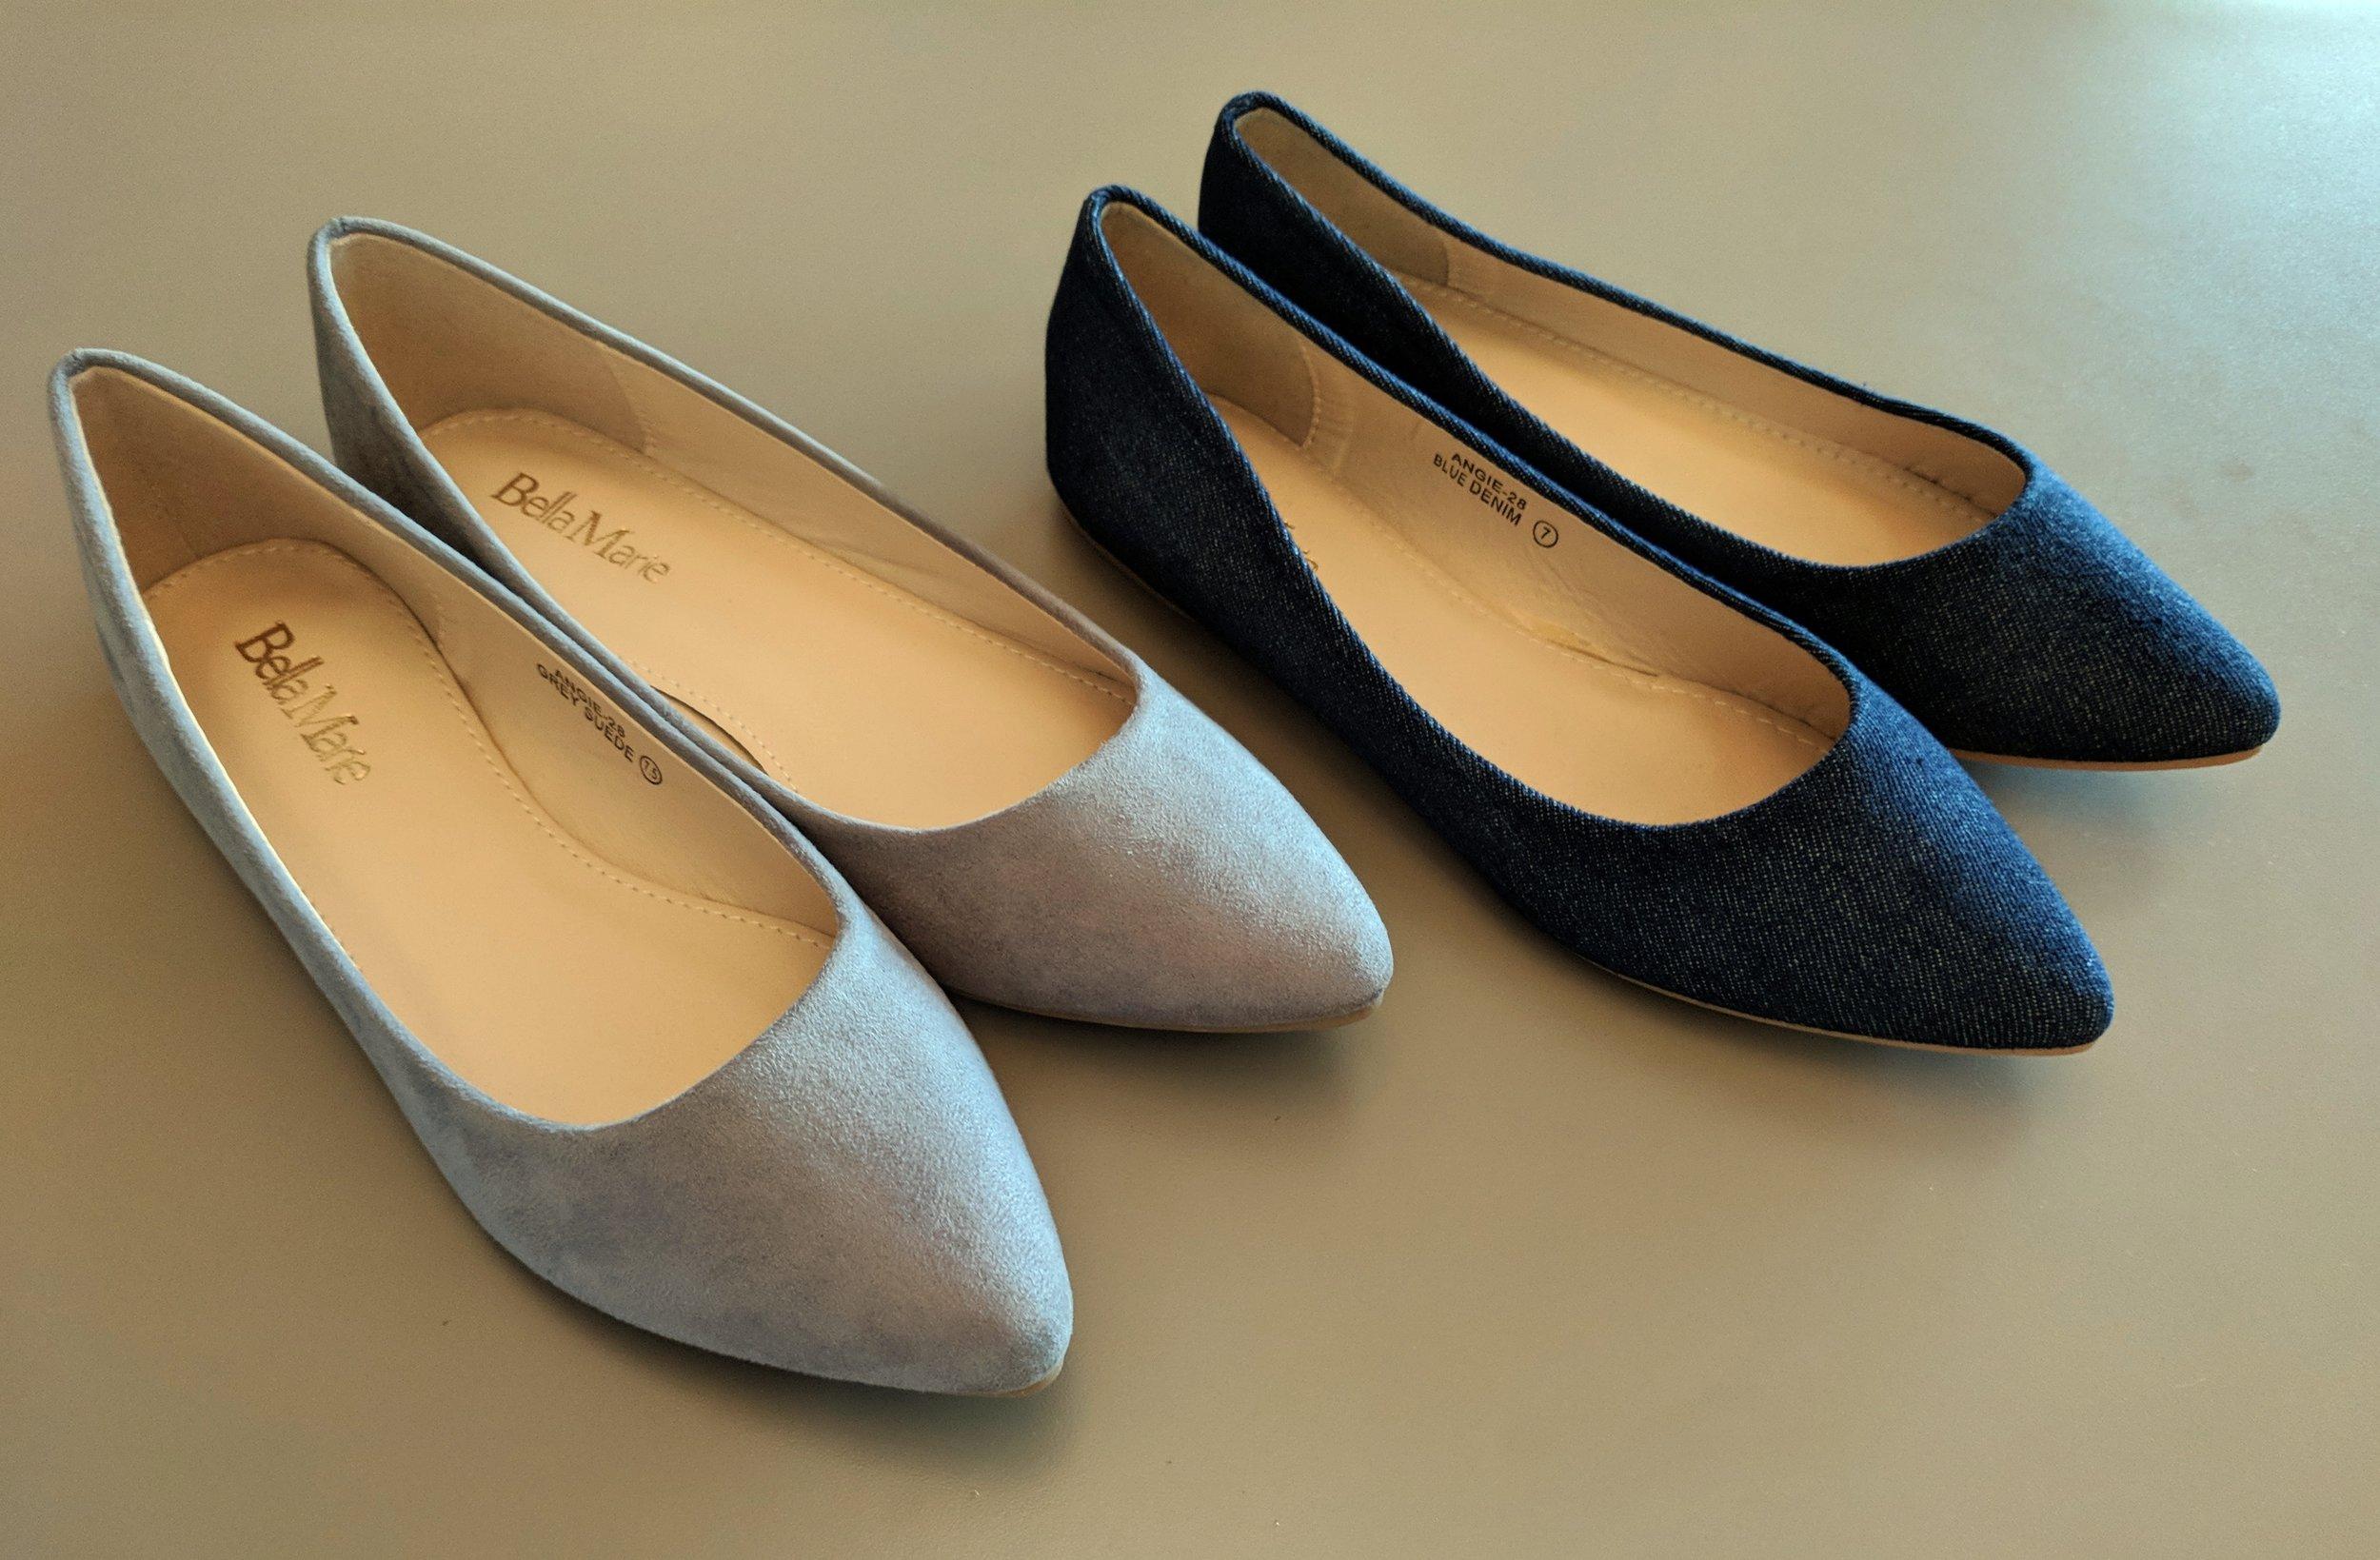 Grey and Denim Flats $28